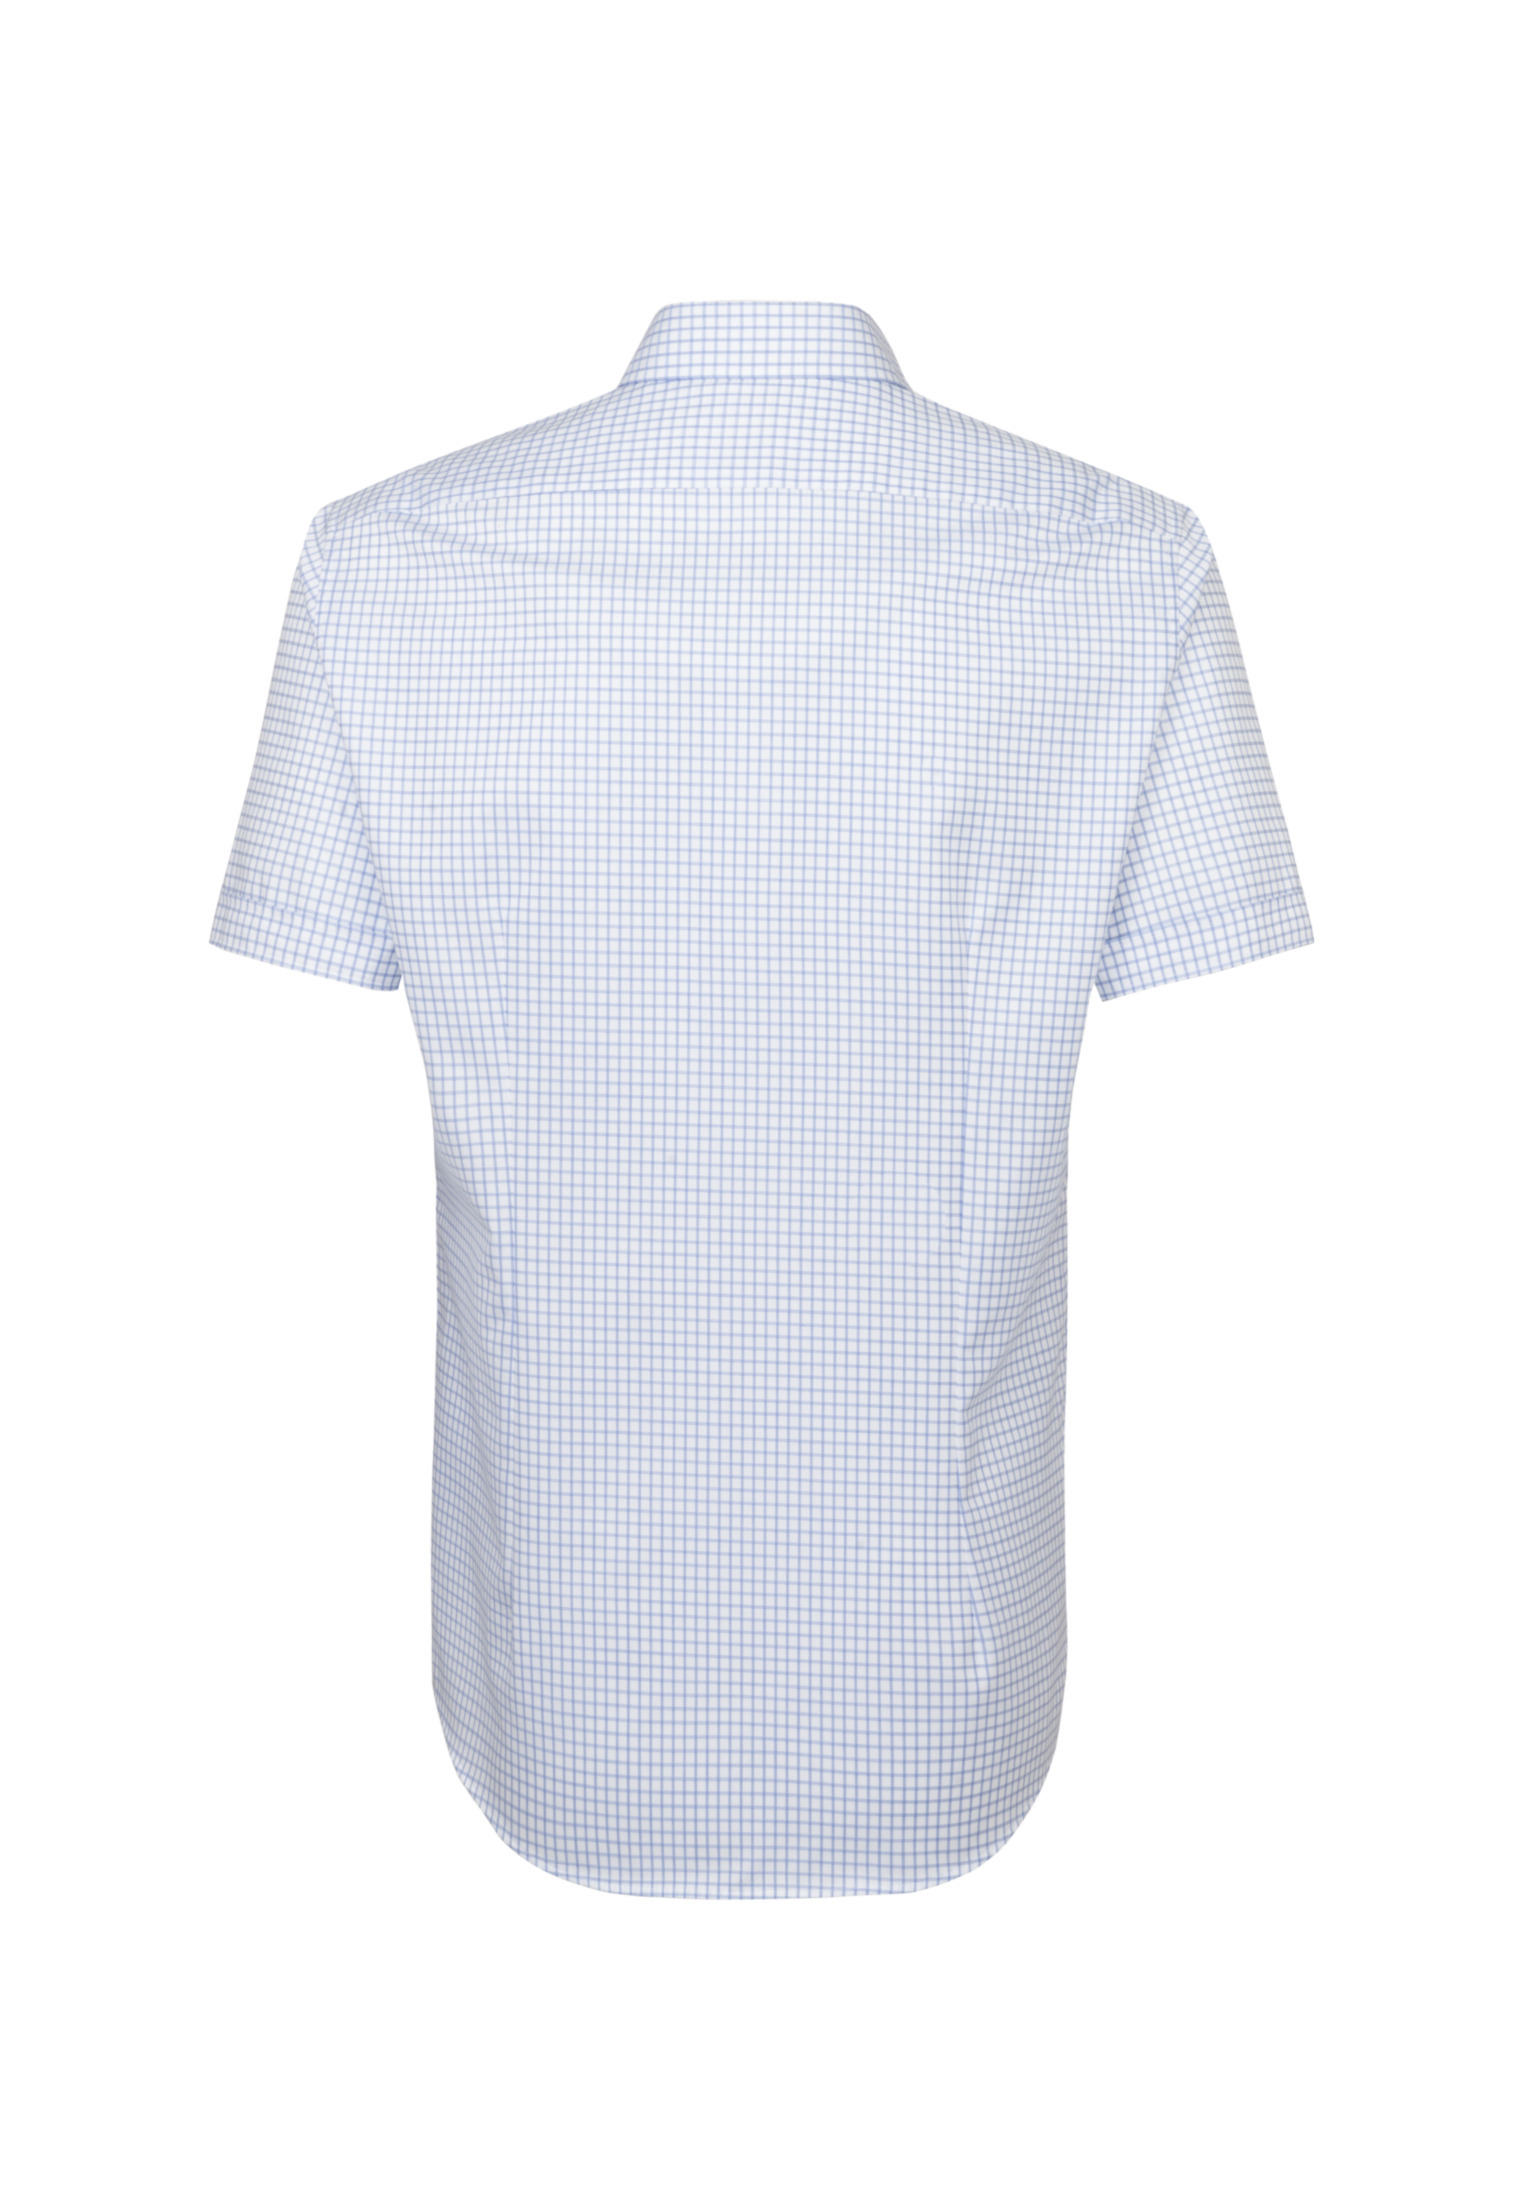 JACQUES BRITT Business Hemd Custom Fit in Hellblau günstig kaufen